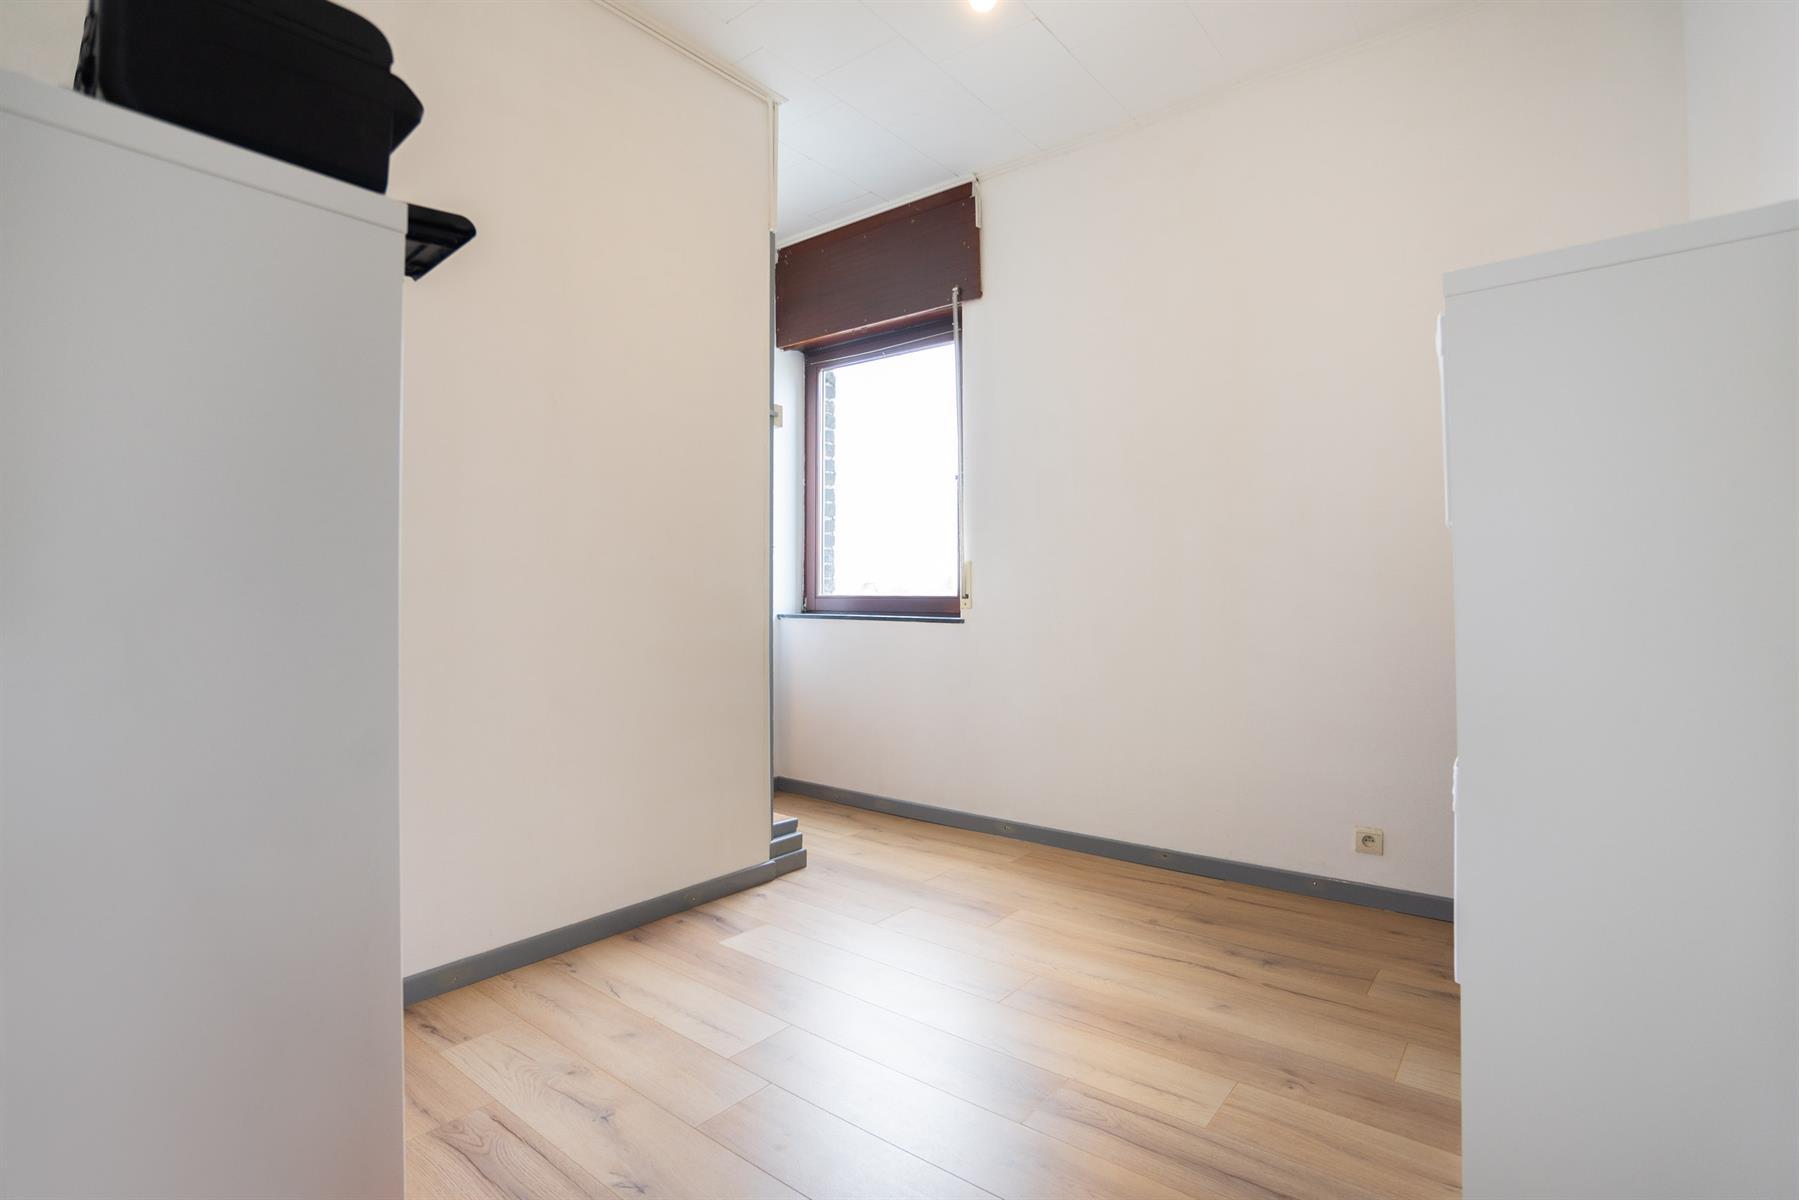 Maison - Beyne-Heusay Bellaire - #4422118-14